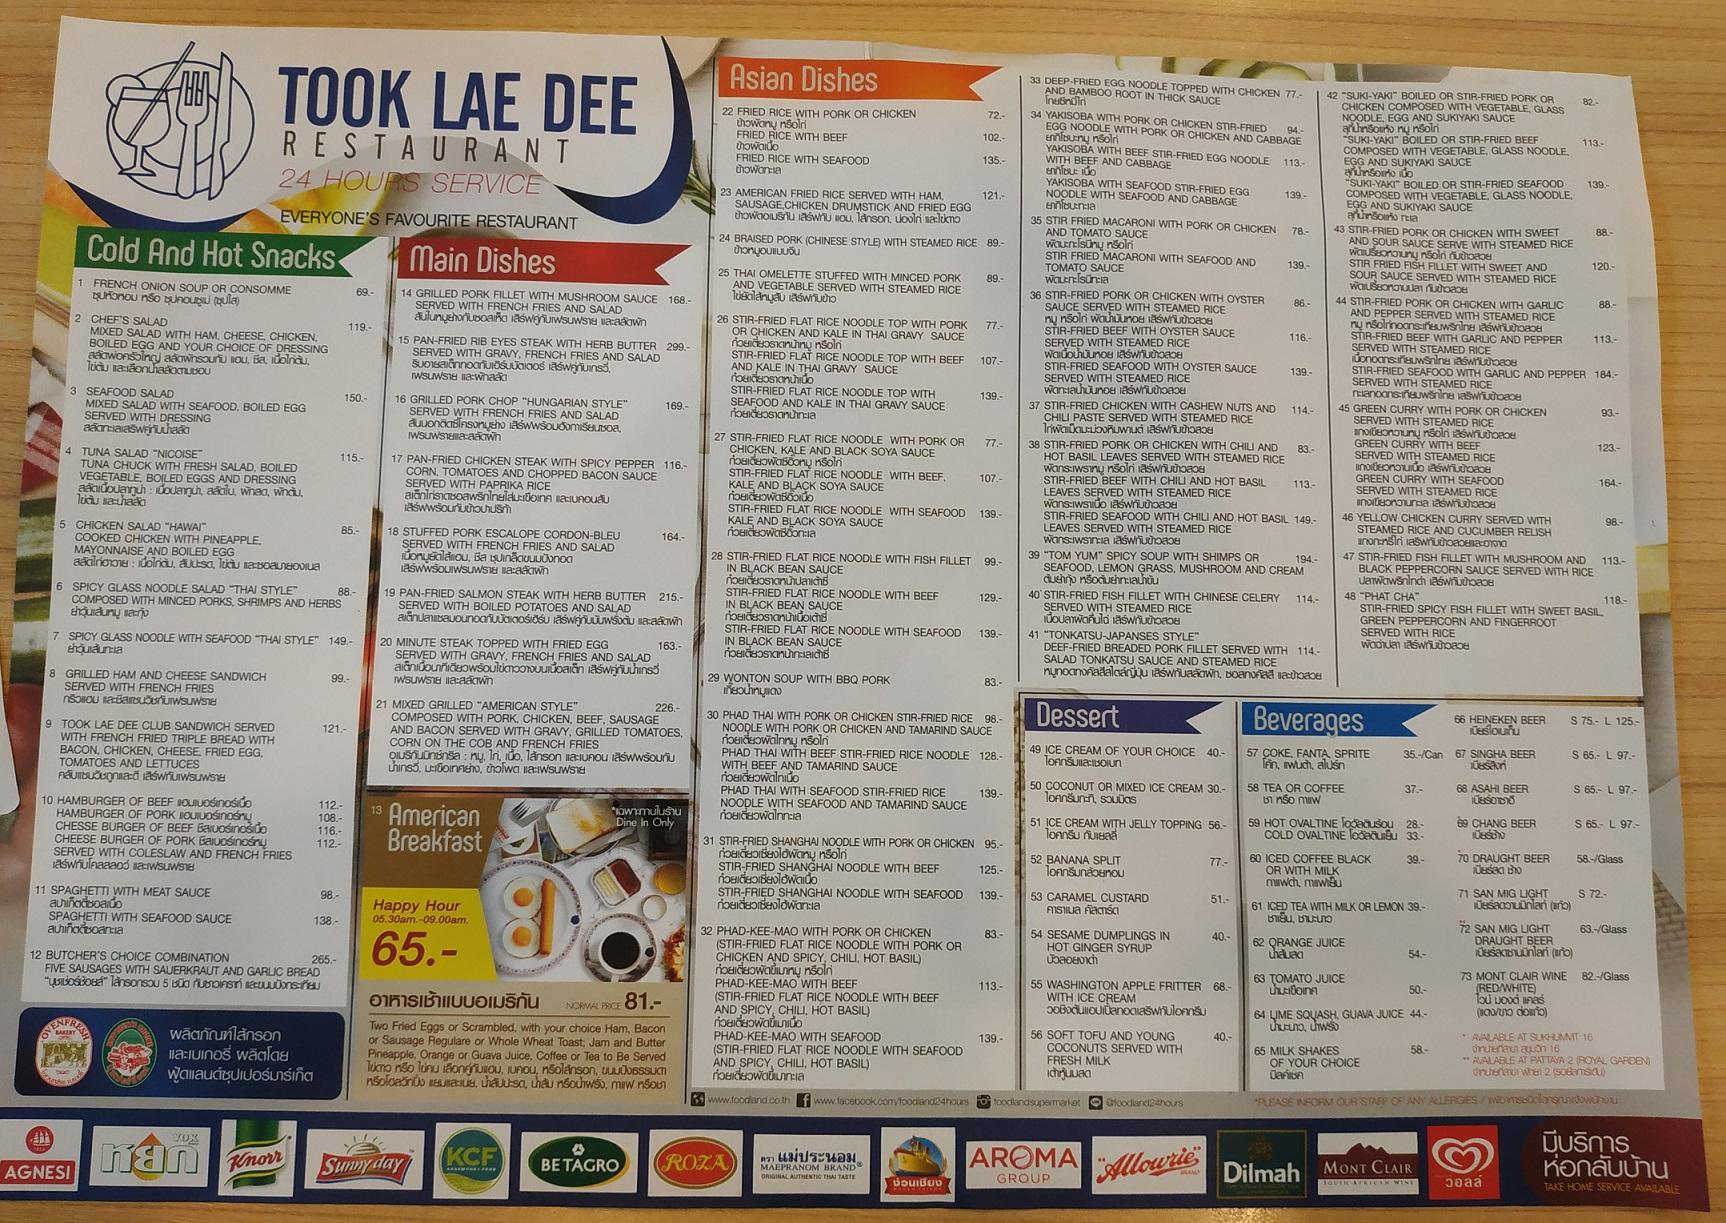 Took Lae Dee ถูกและดี in Bangkok Menu